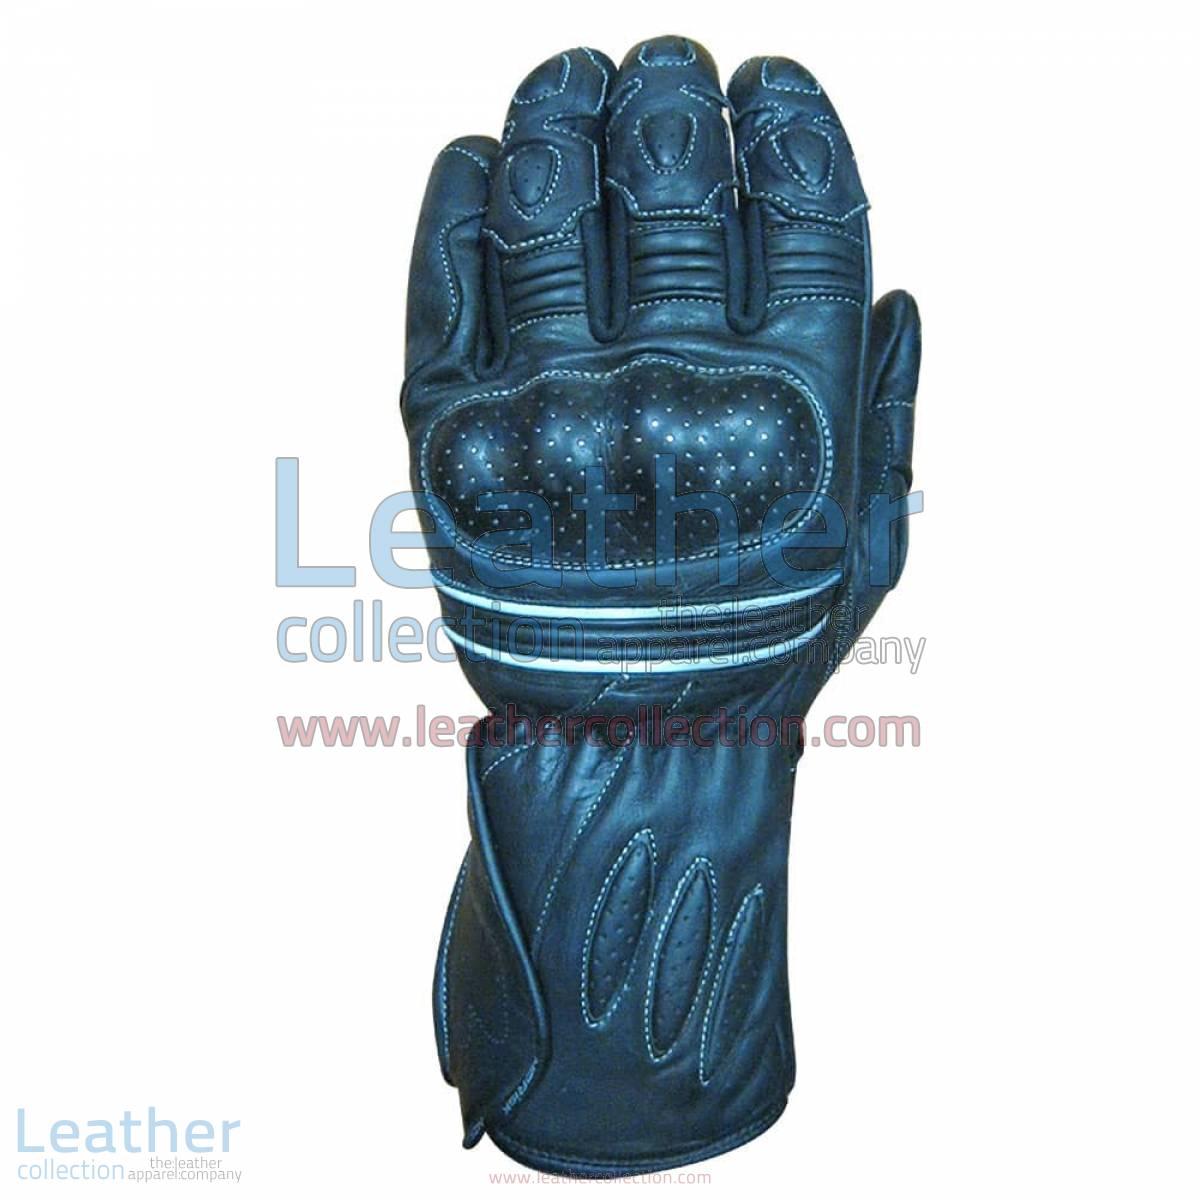 Superior Leather Moto Gloves | leather moto gloves